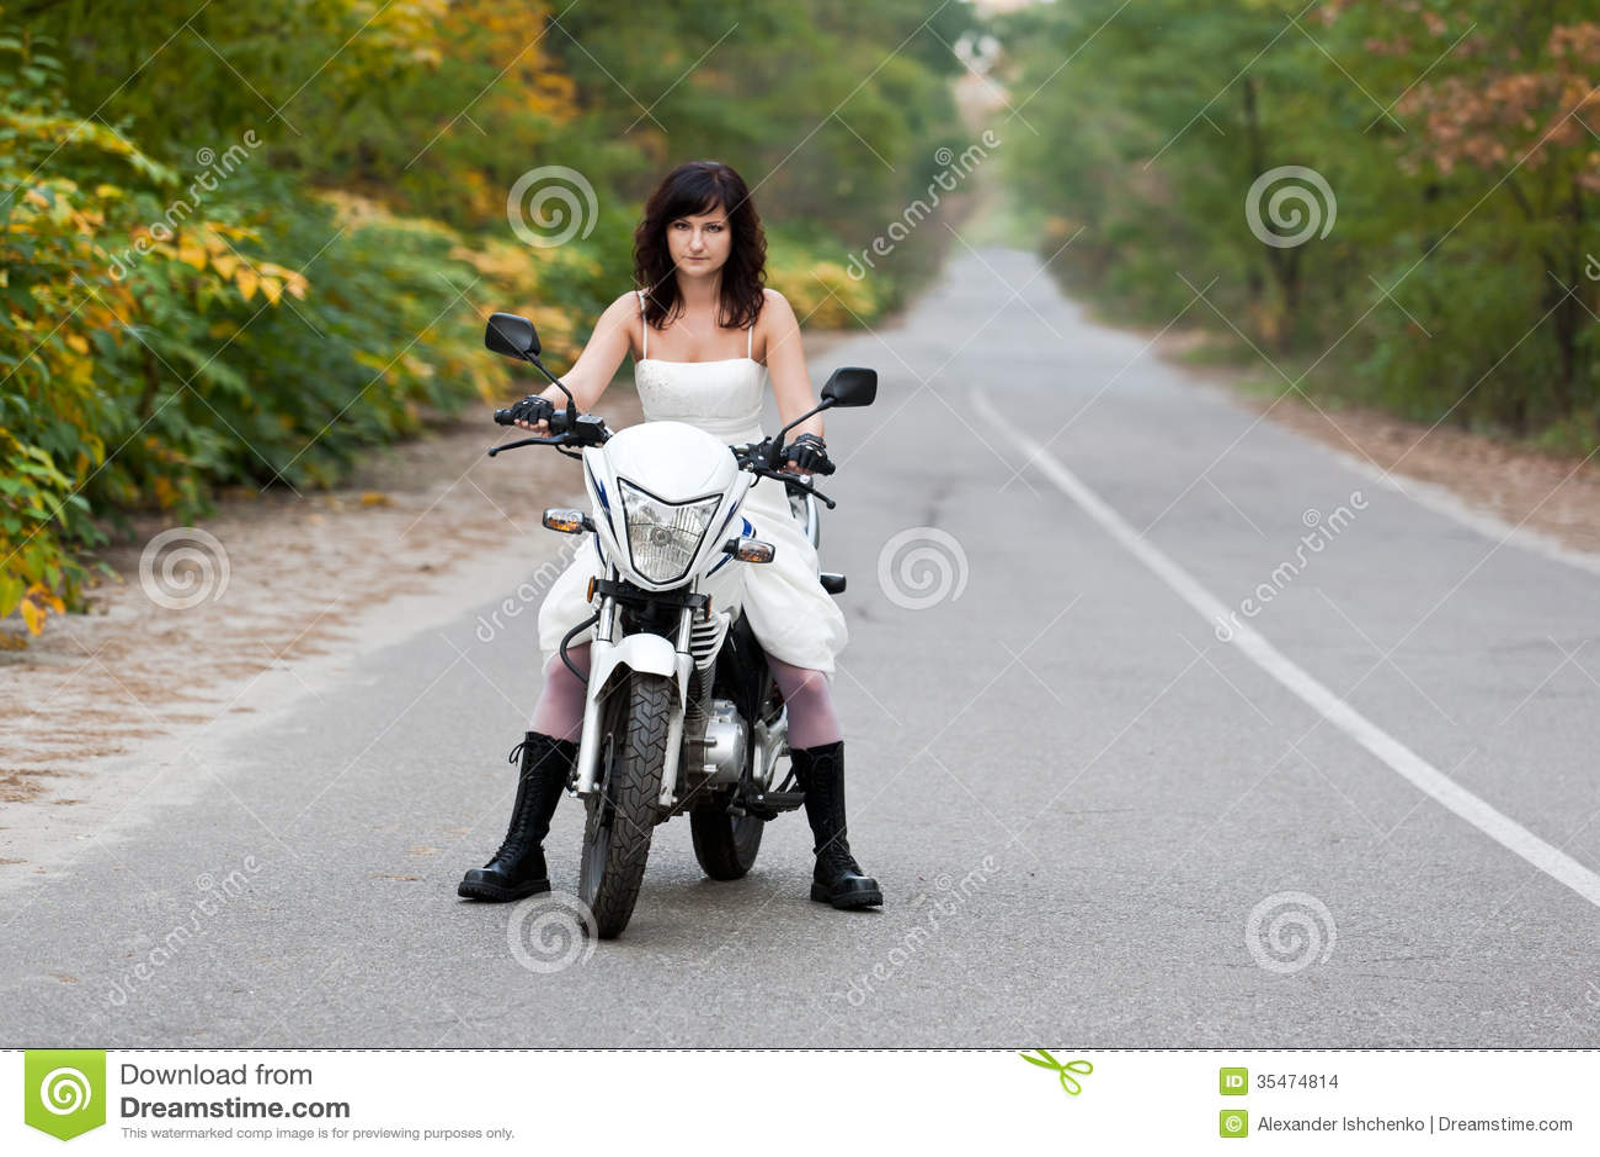 Wedding dresses: wedding dresses for motorcycles